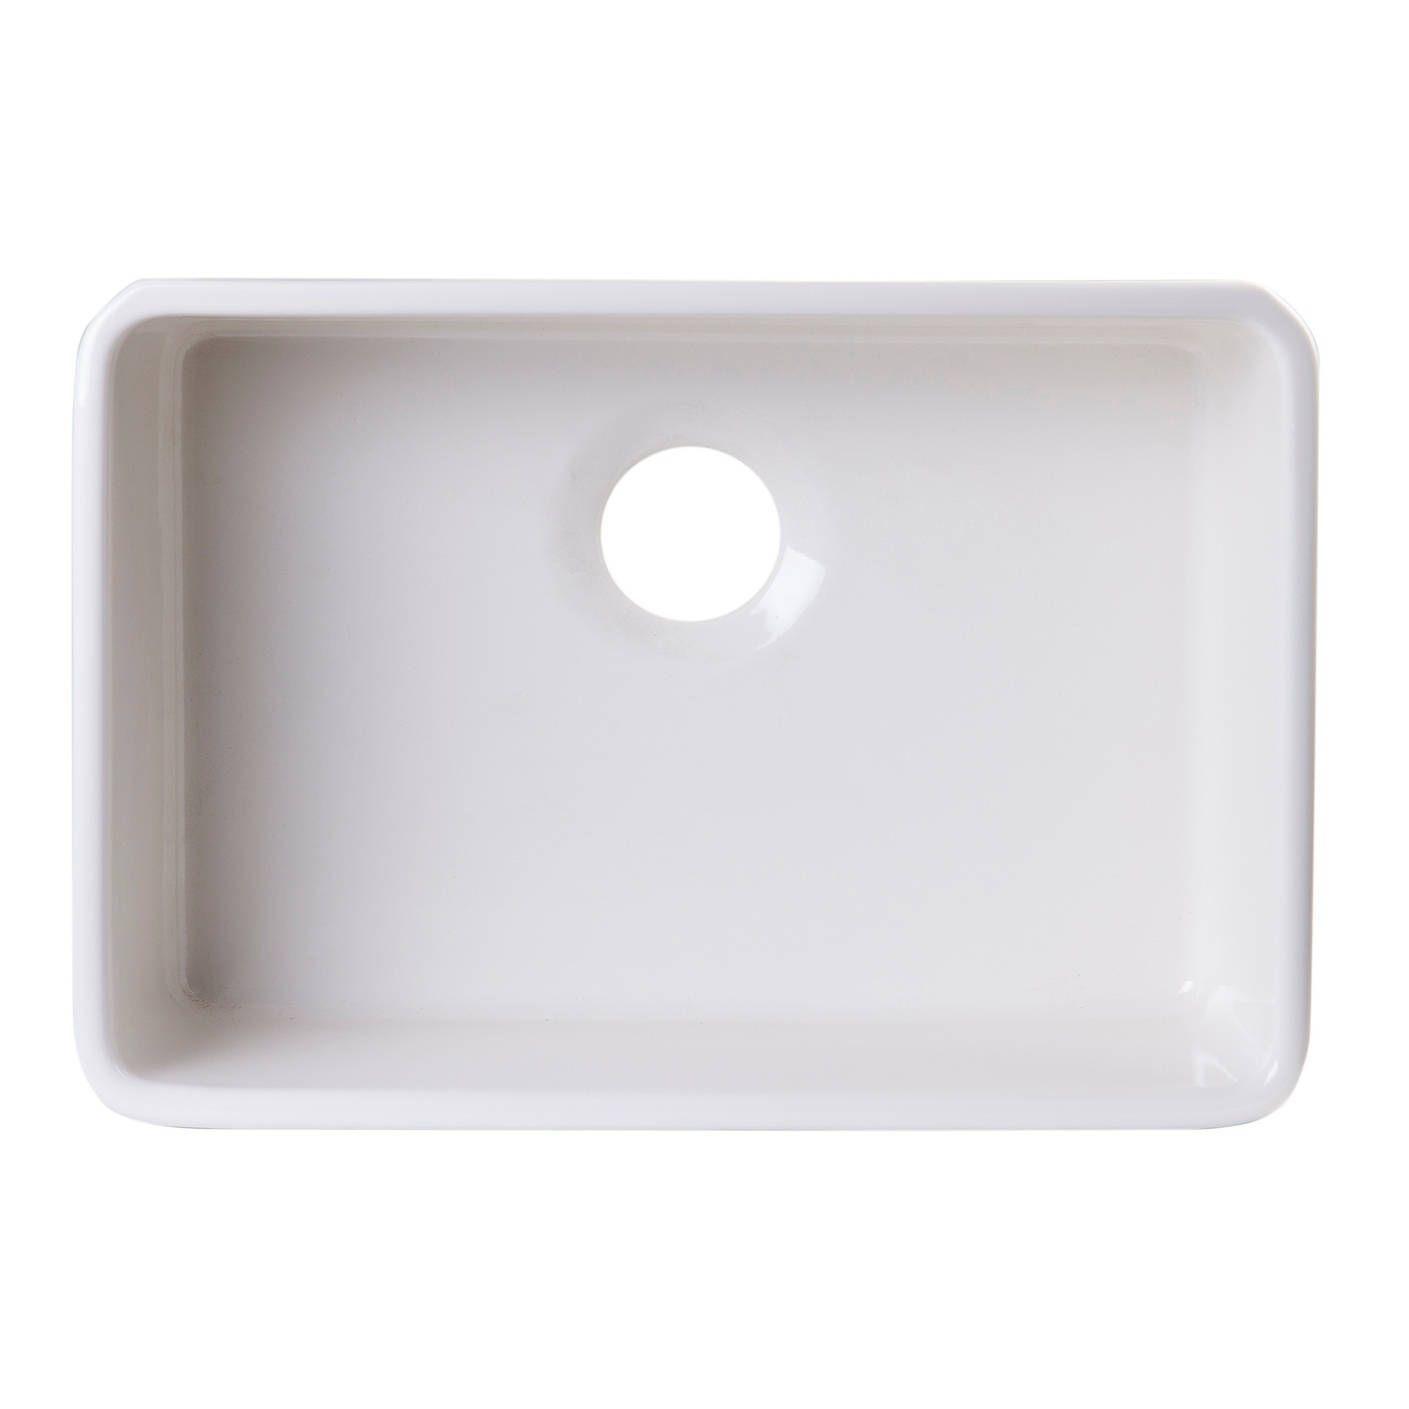 Alfi brand ABUM inch Biscuit Single Bowl Fireclay Undermount